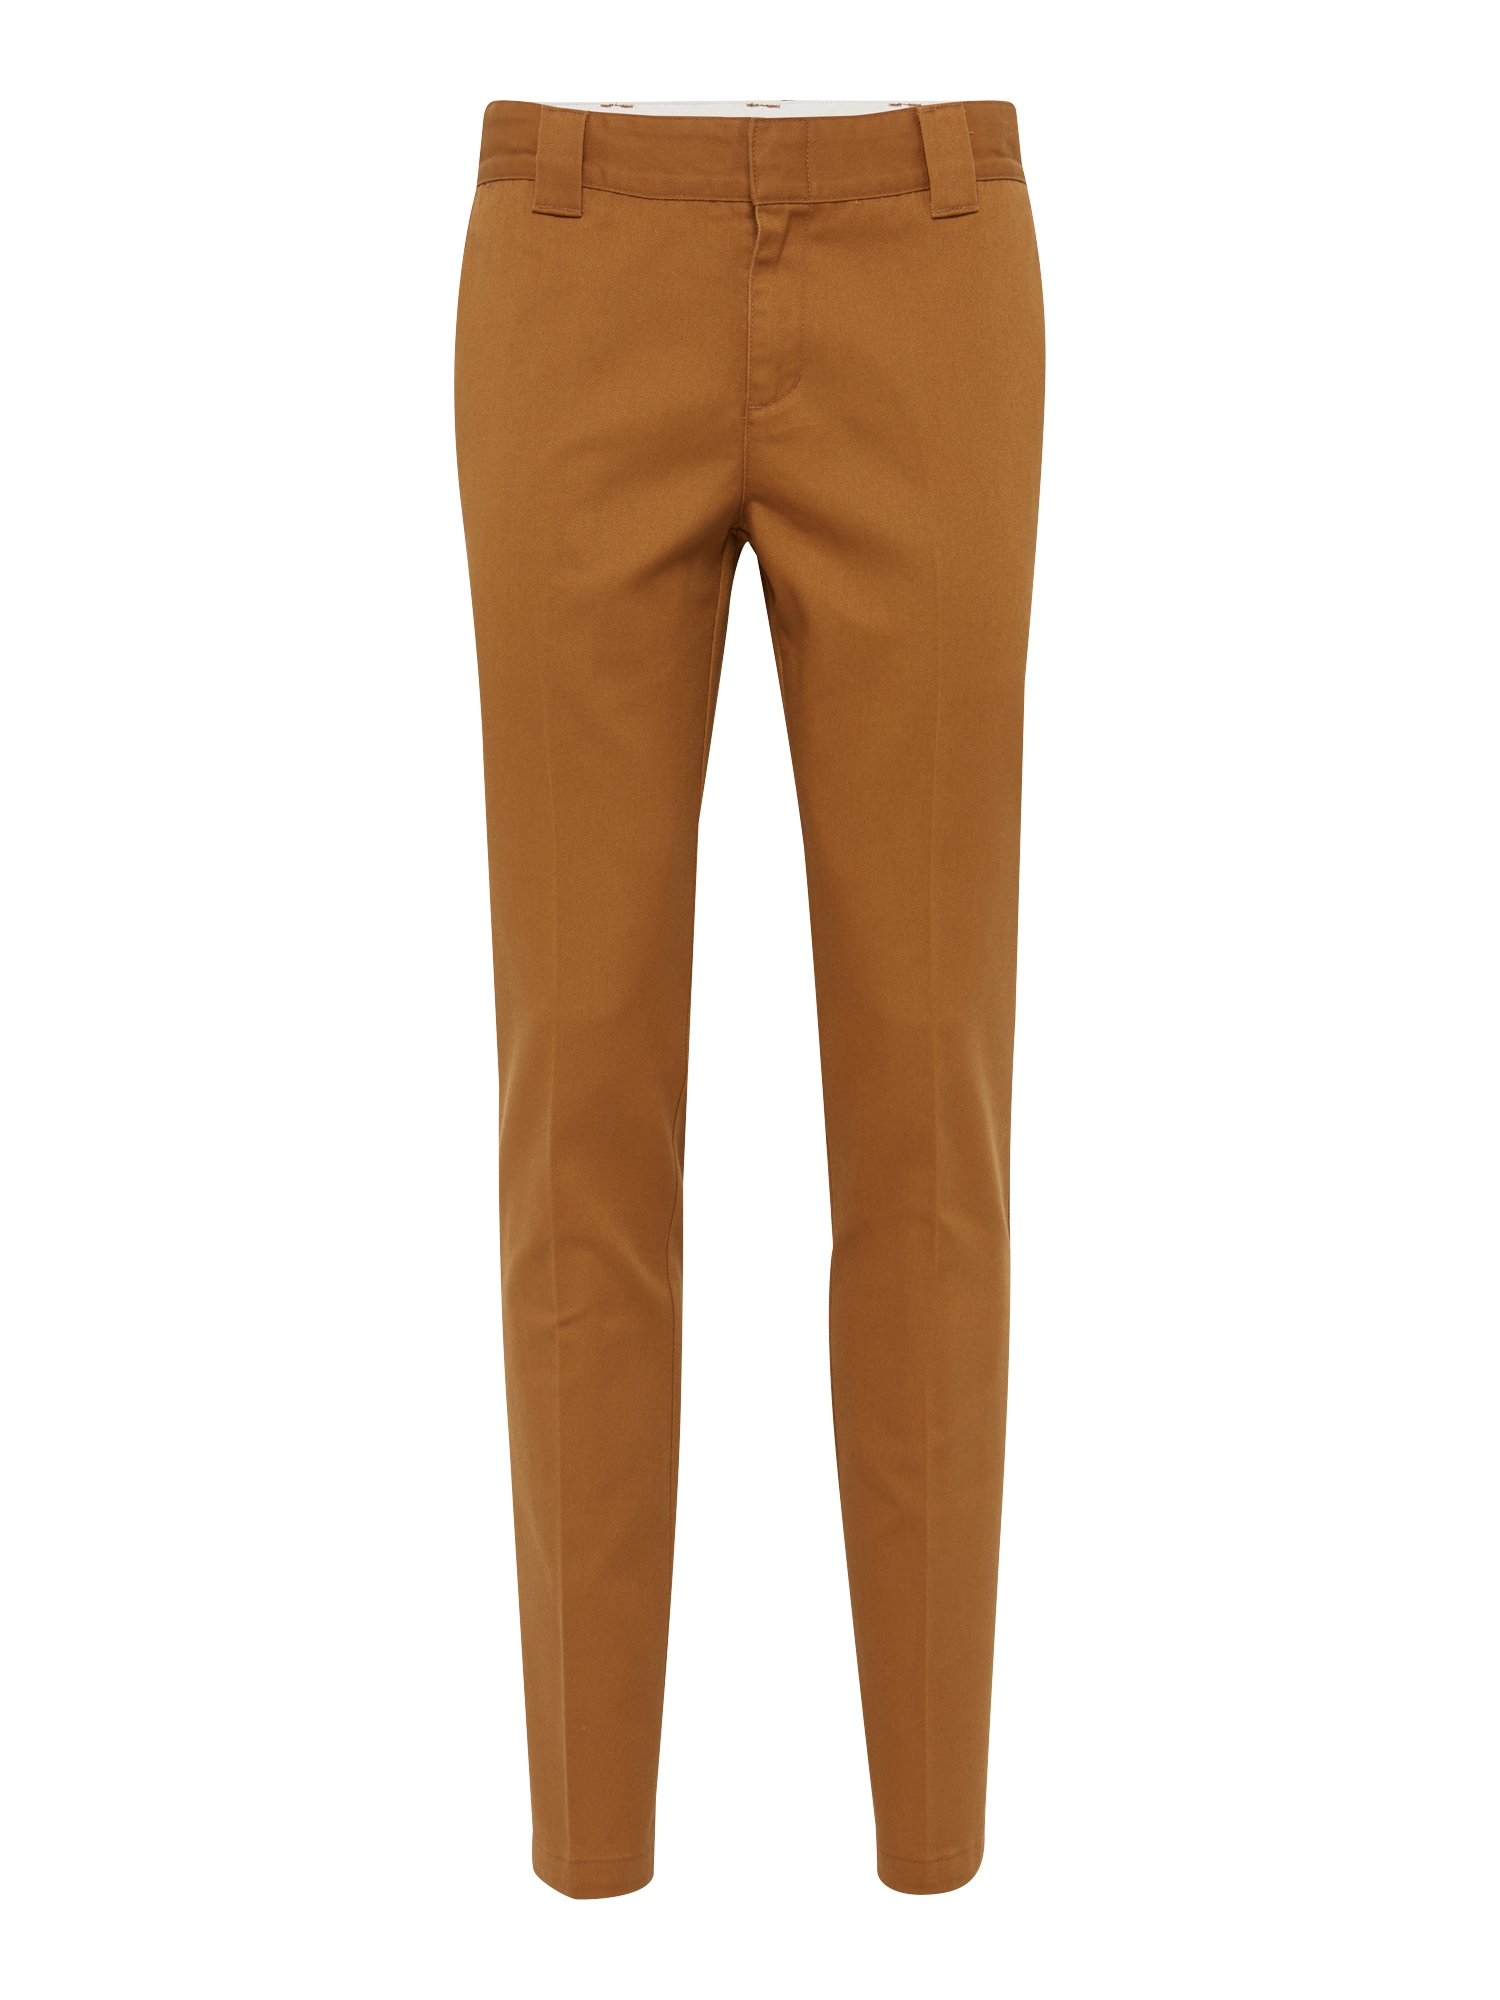 Chino kalhoty WE872 koňaková DICKIES